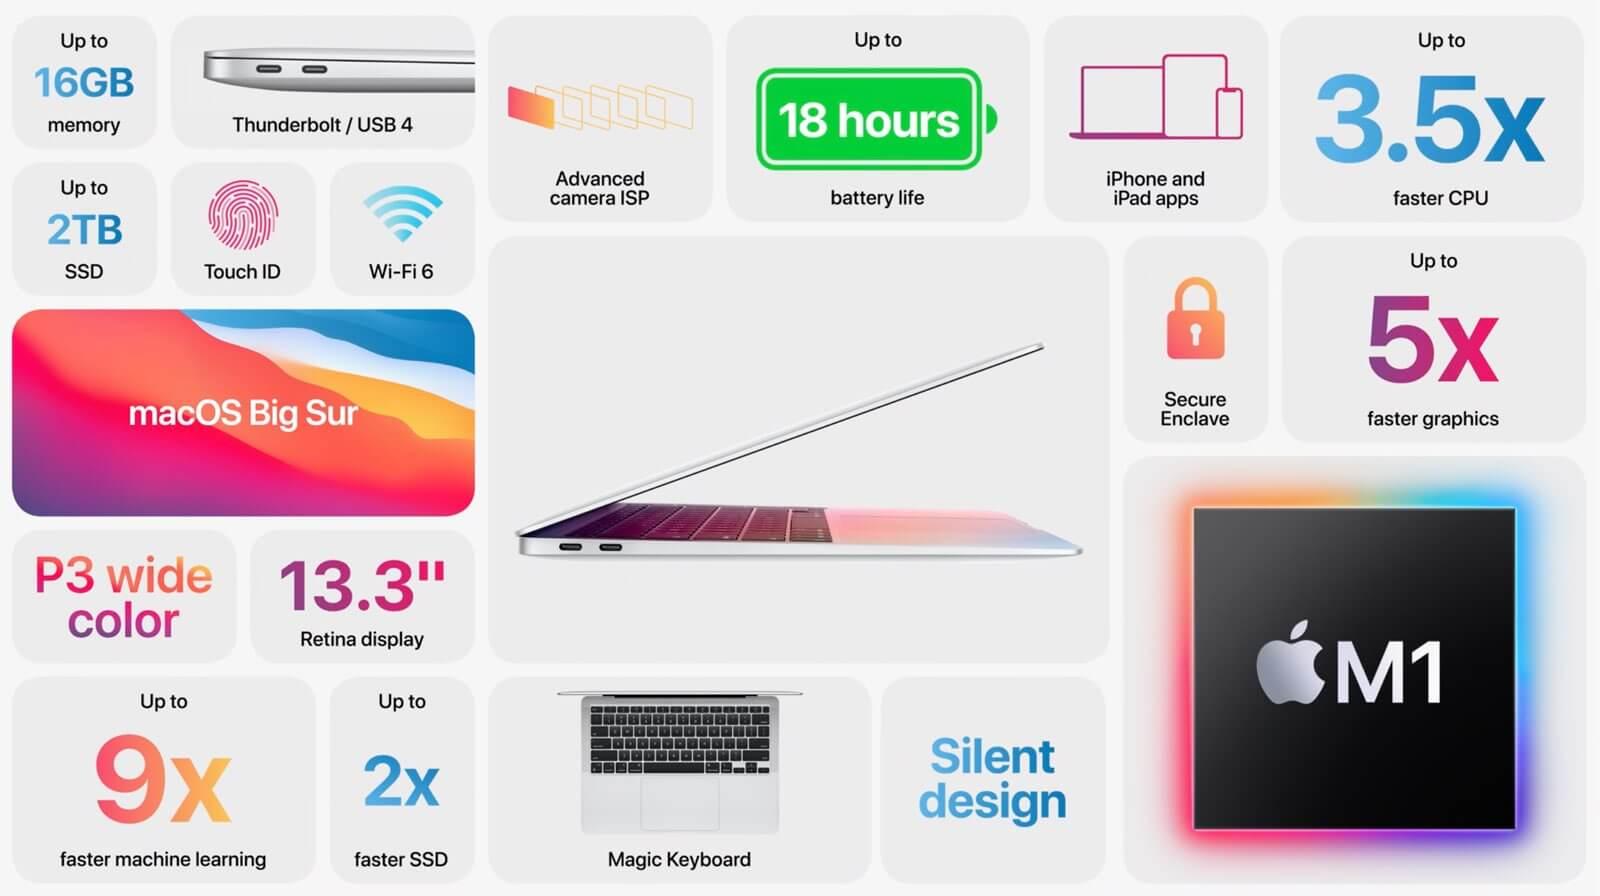 Apple M1 晶片大受好評!Intel 認為處理器架構不同,數據與使用者體驗有差異